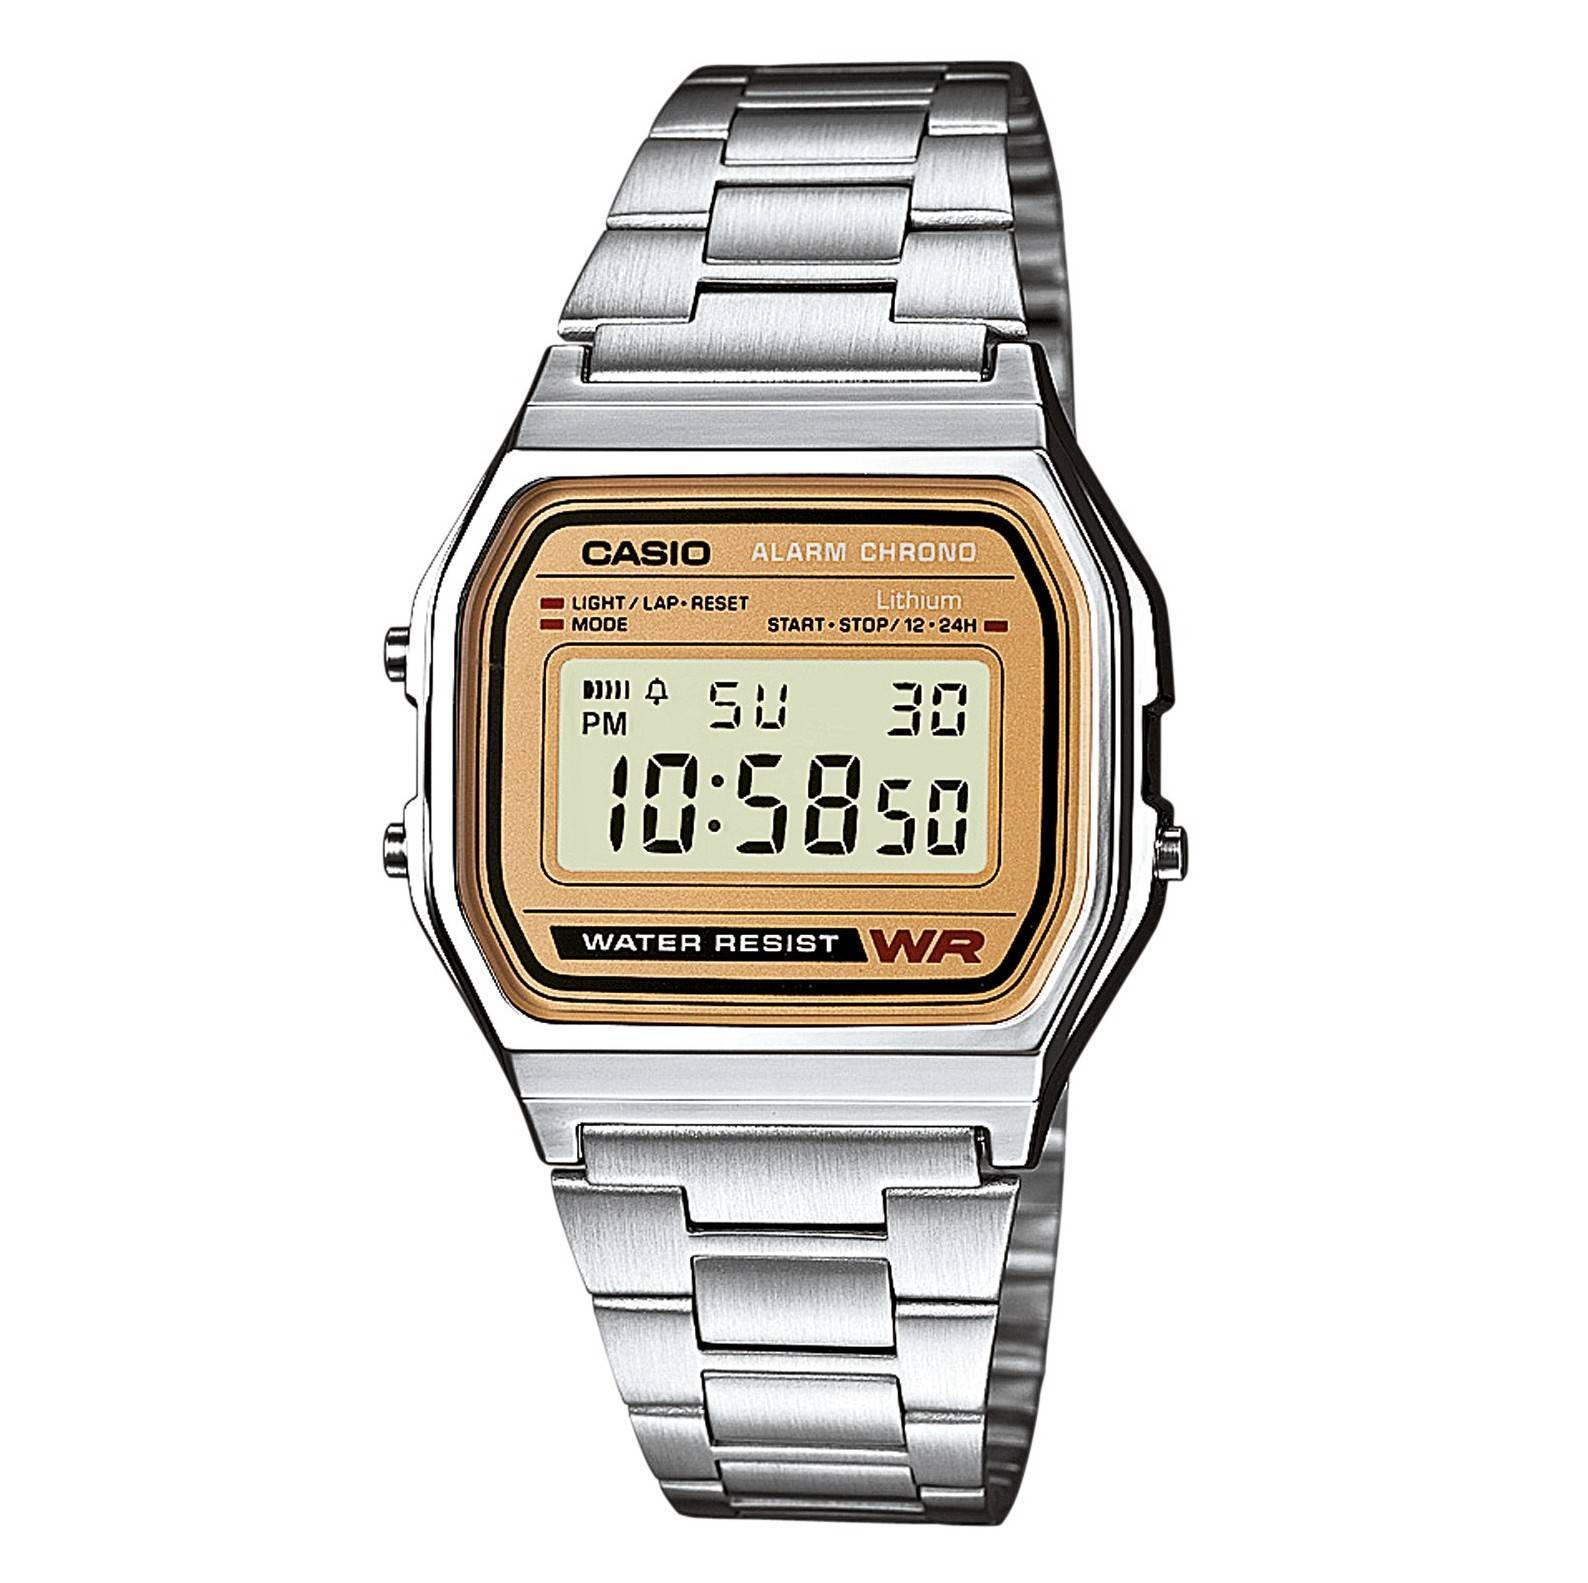 29008e6eba19 Reloj Casio retro dorado digital Joyería Juan Luis Larráyoz Pamplona  comprar relojes casio joyería online